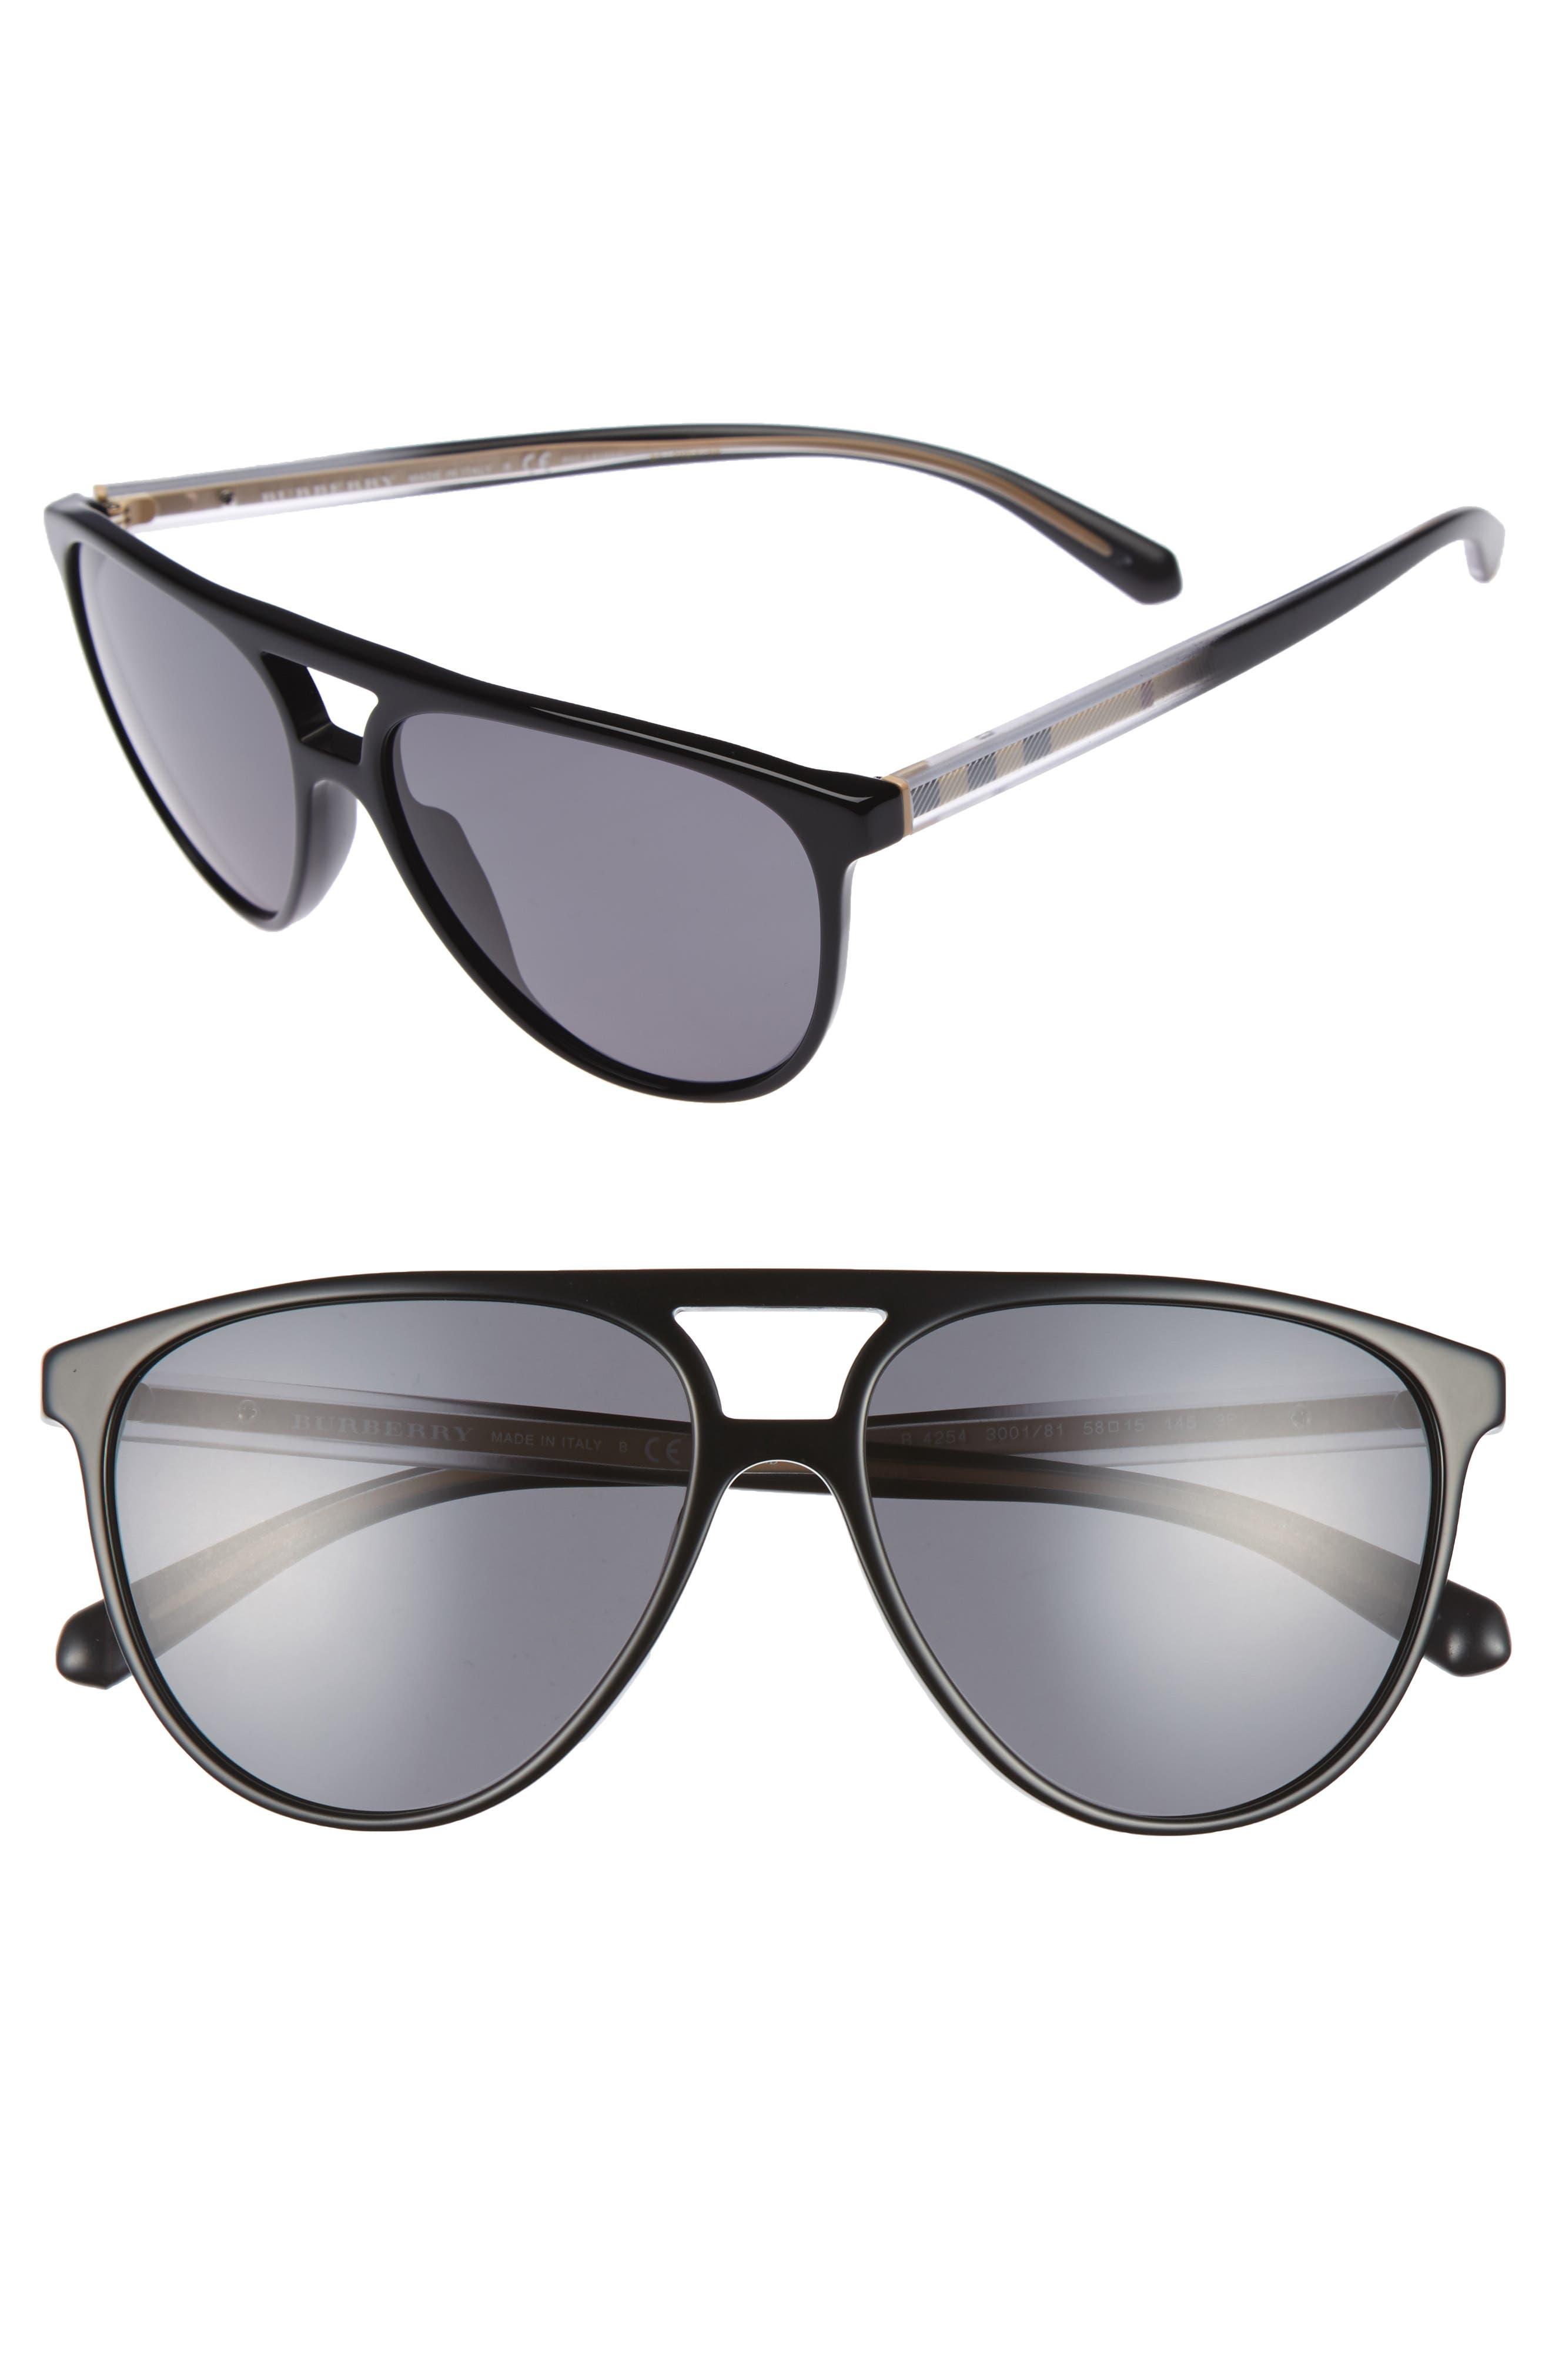 BURBERRY 58mm Polarized Aviator Sunglasses